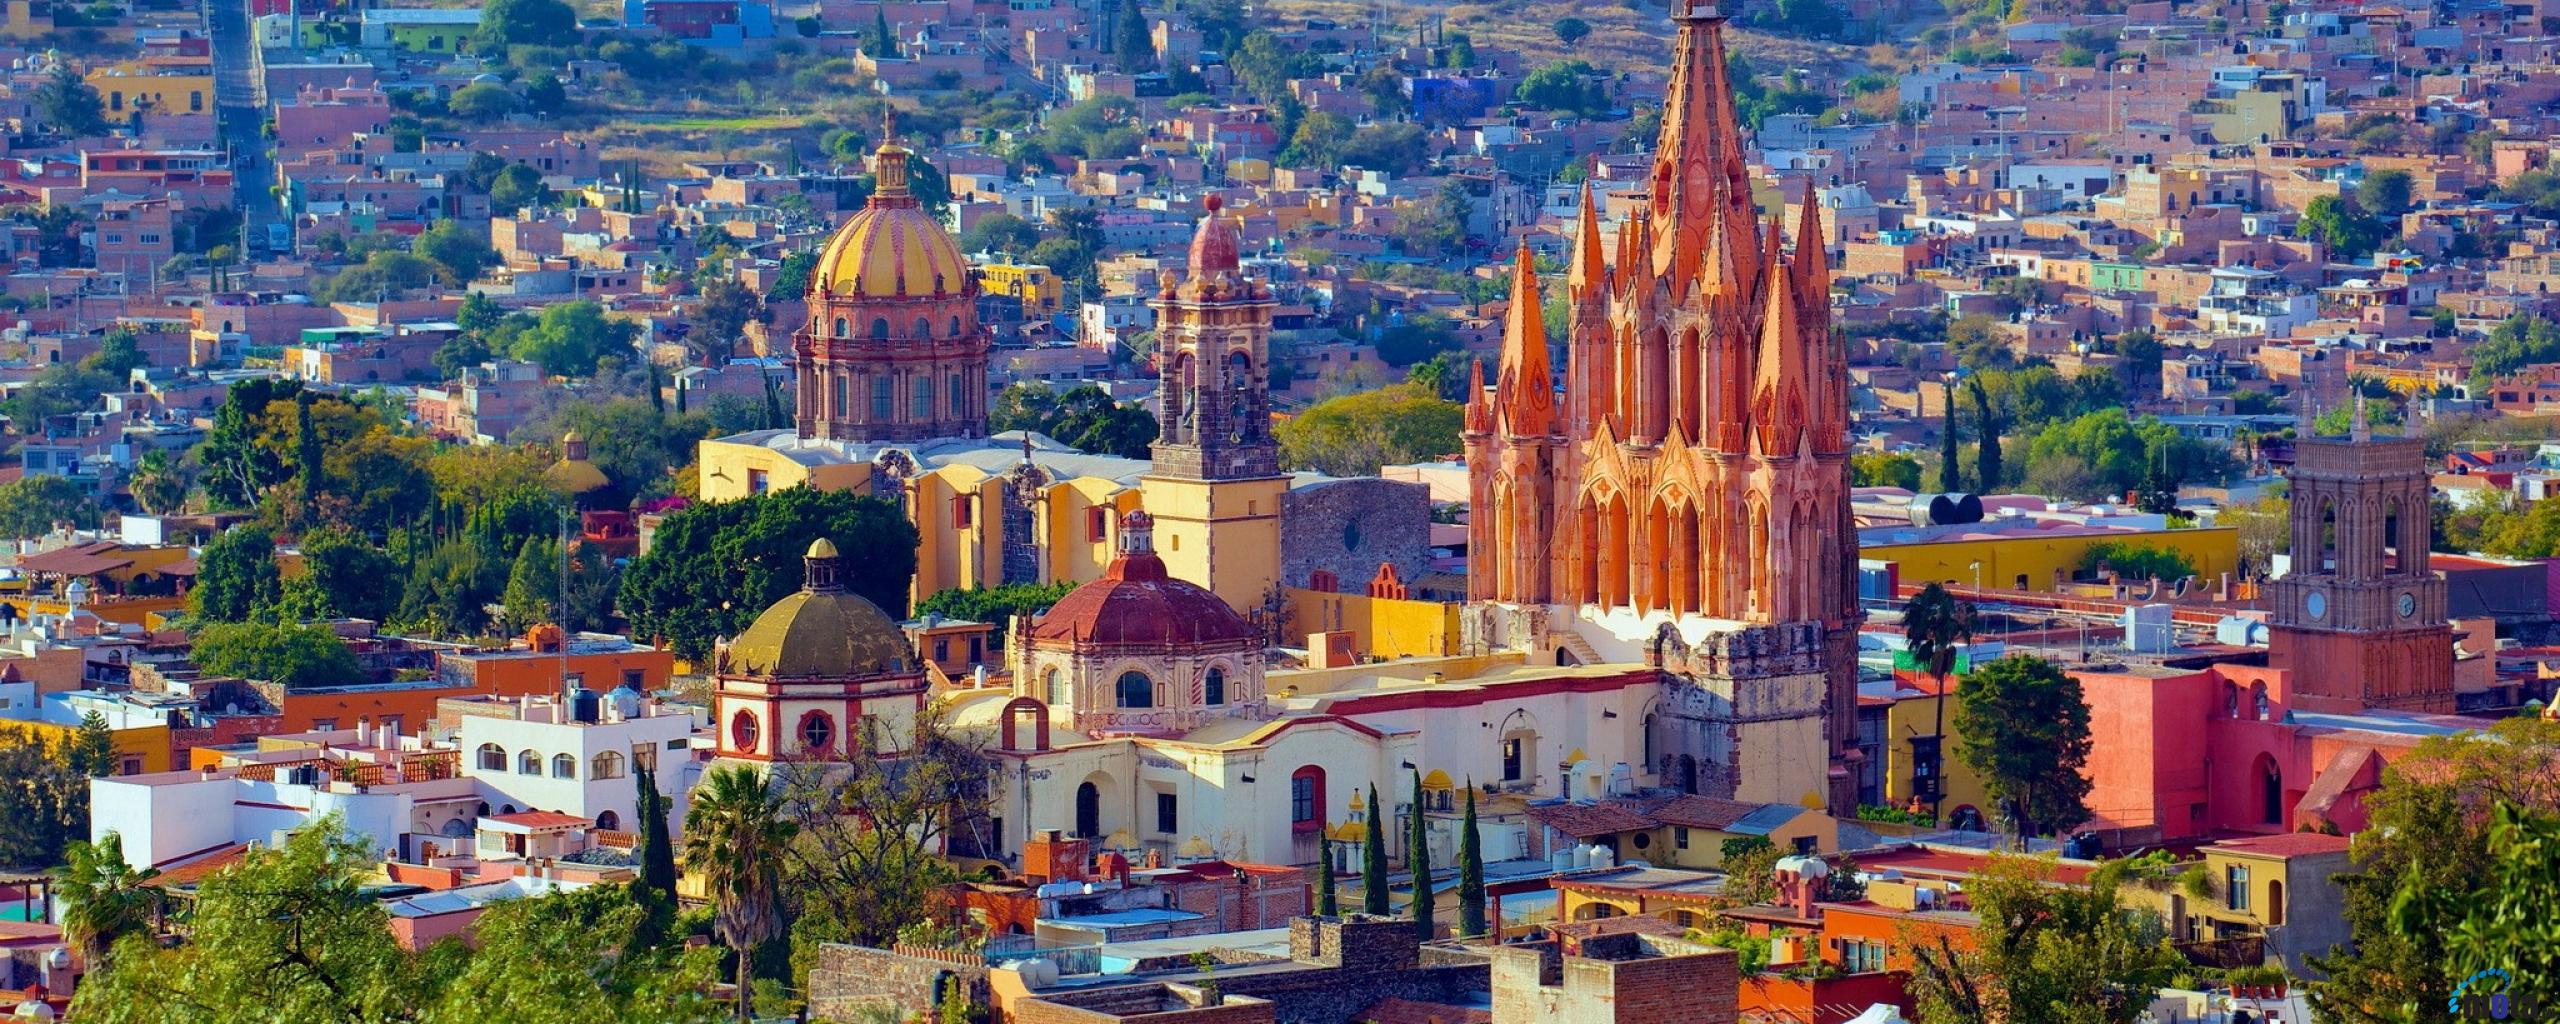 mehico_meksika_original